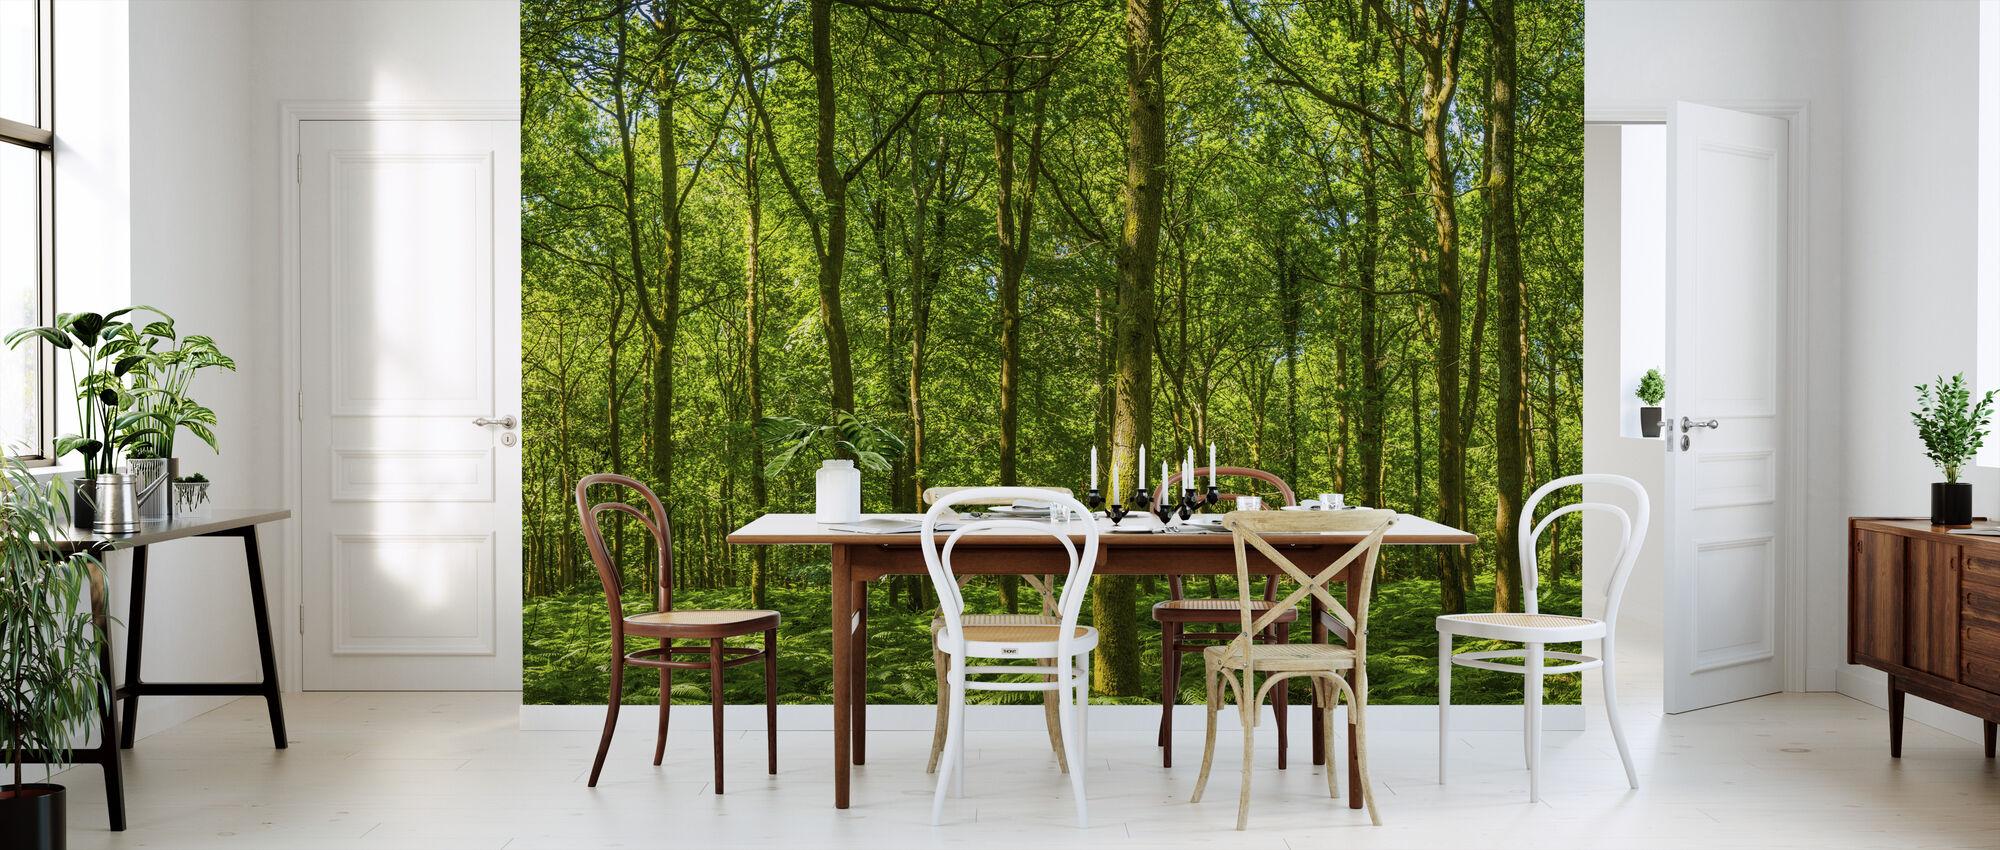 Emerald Green Panorama Forest - Wallpaper - Kitchen